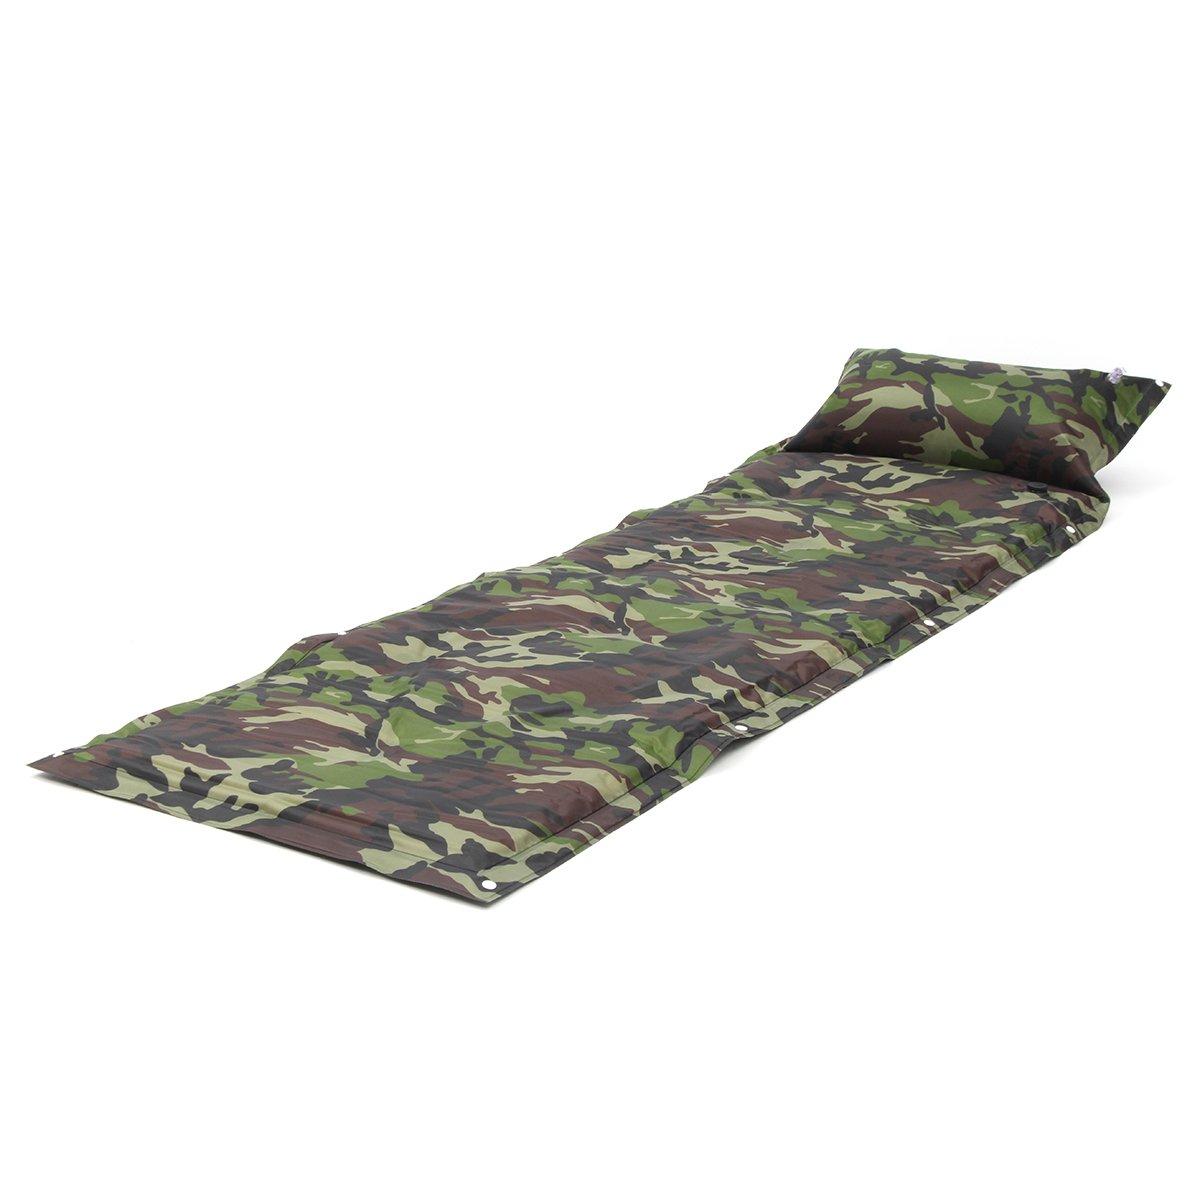 Kenthia Single selbstaufblasende Isomatte aufblasbar Air Matratze Sleeping Pad mit Kopfkissen